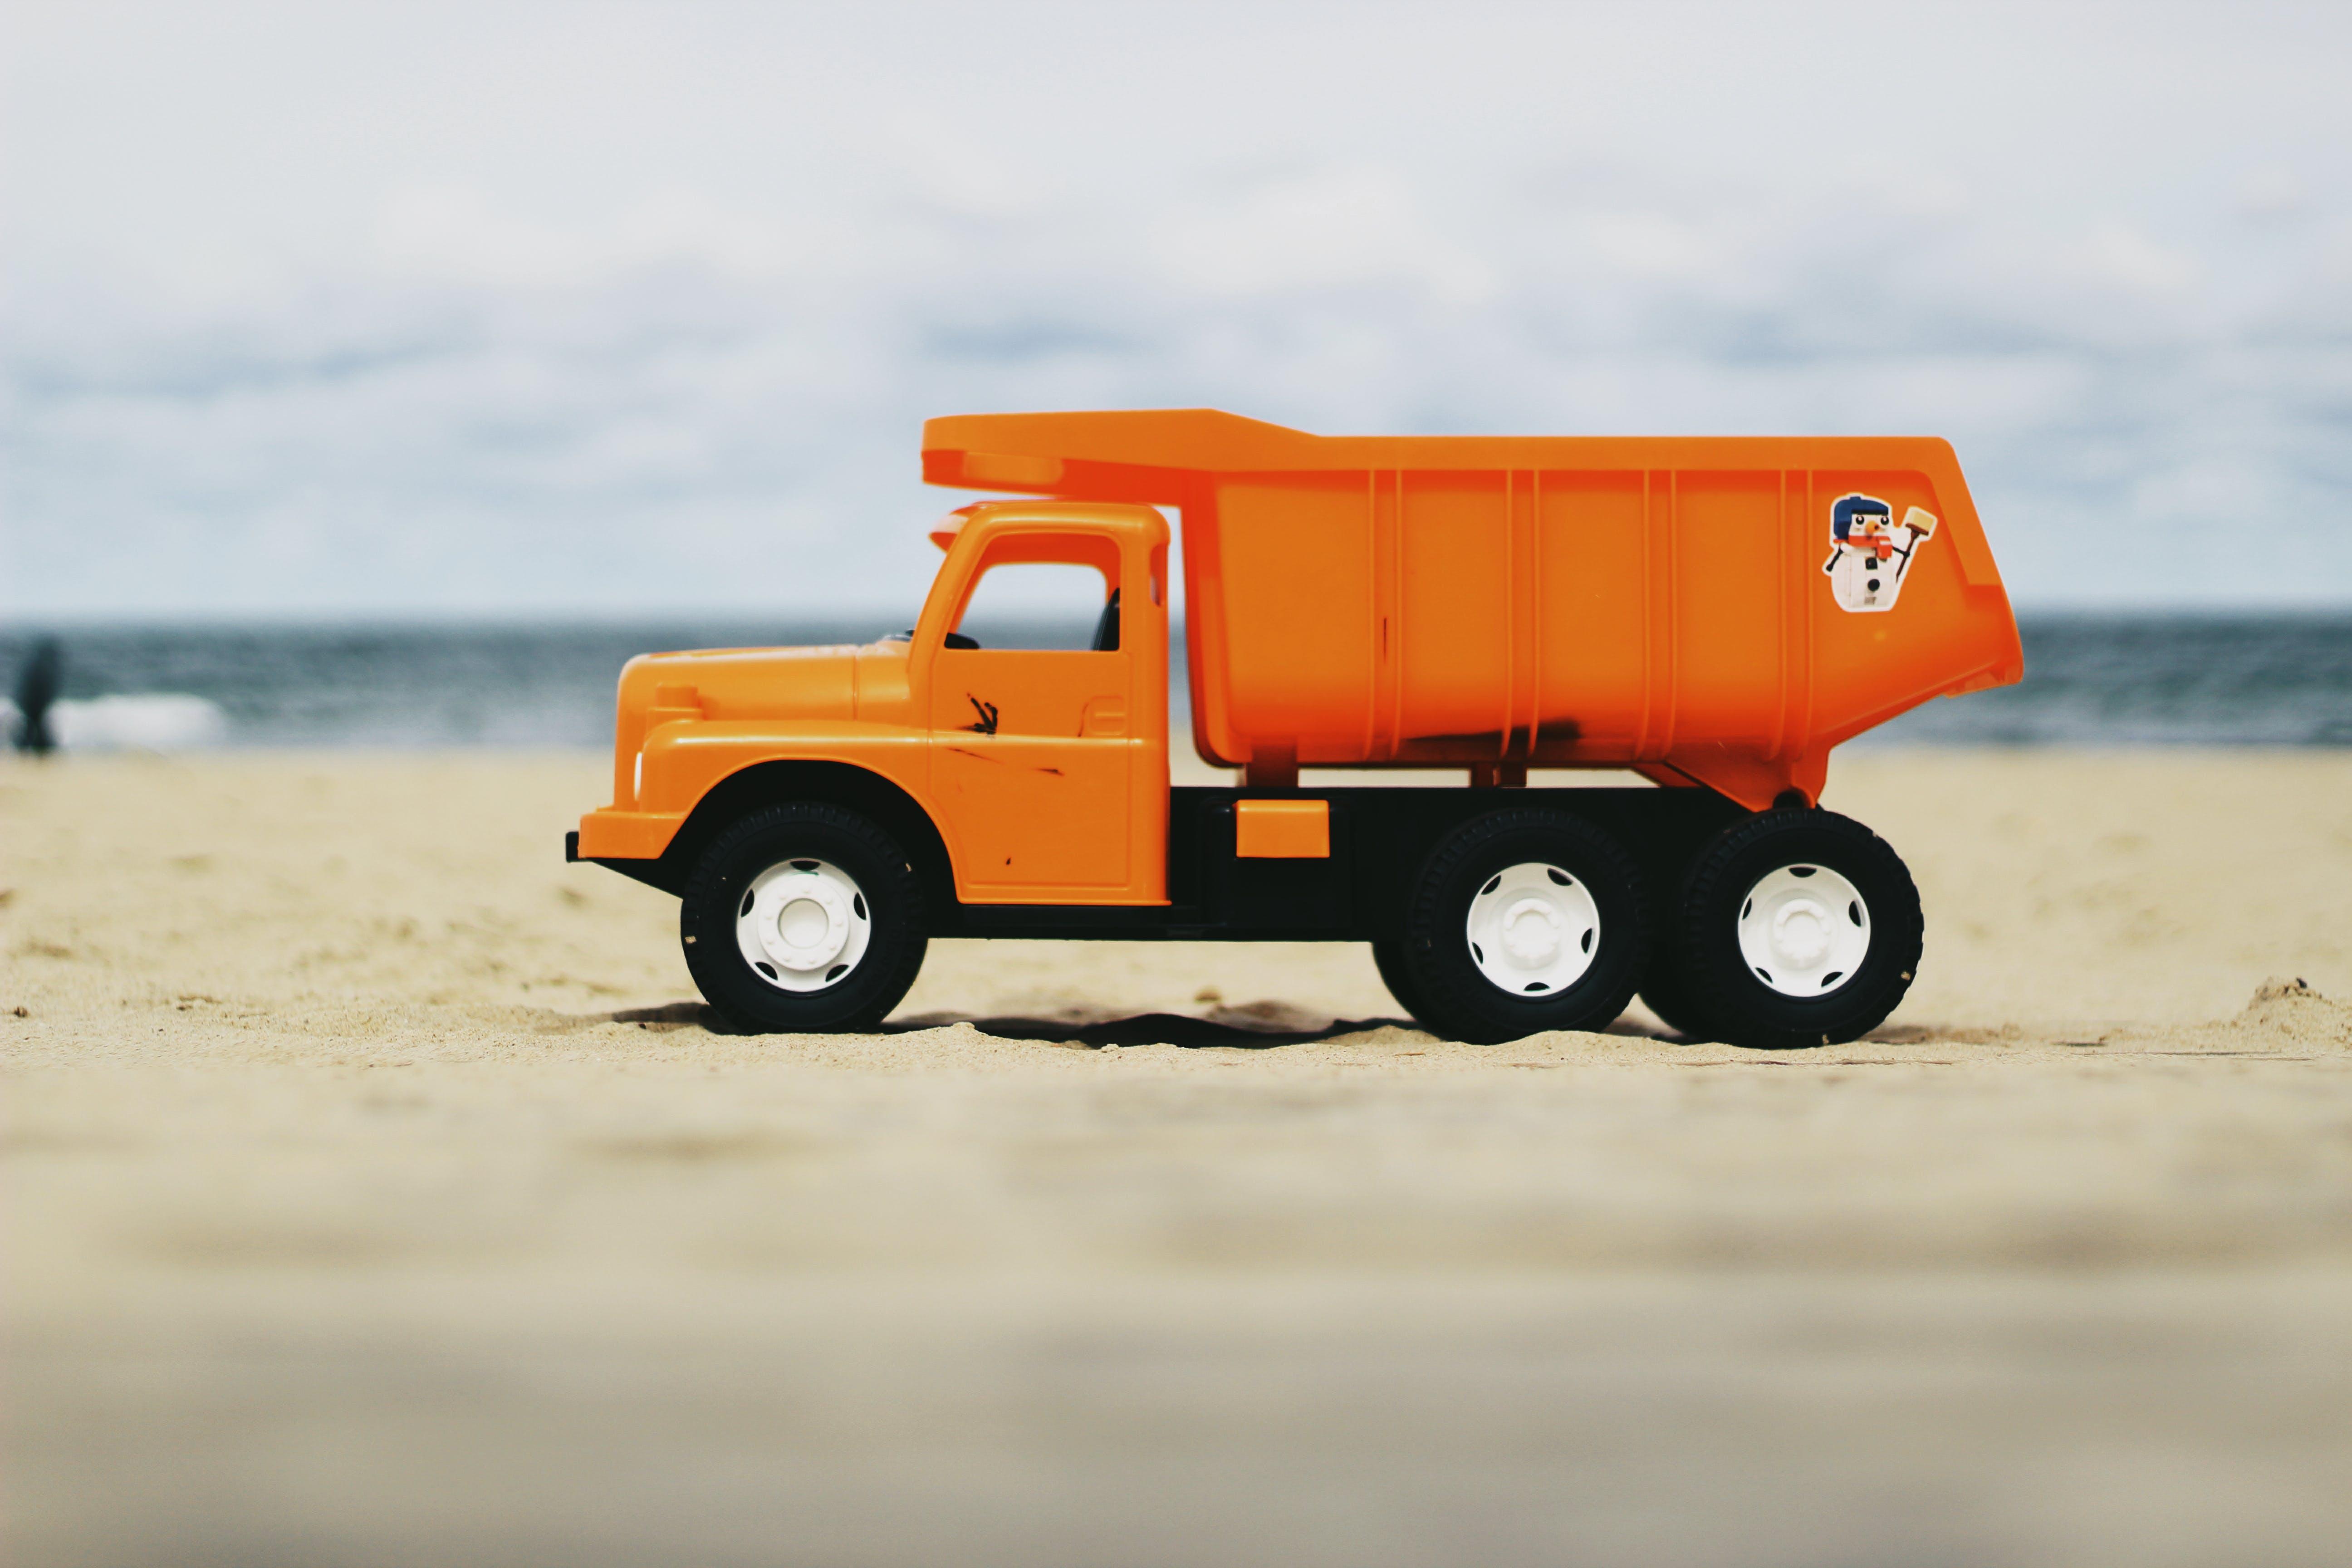 Kostenloses Stock Foto zu orange, spielzeug, spielzeuglastwagen, plastikspielzeug